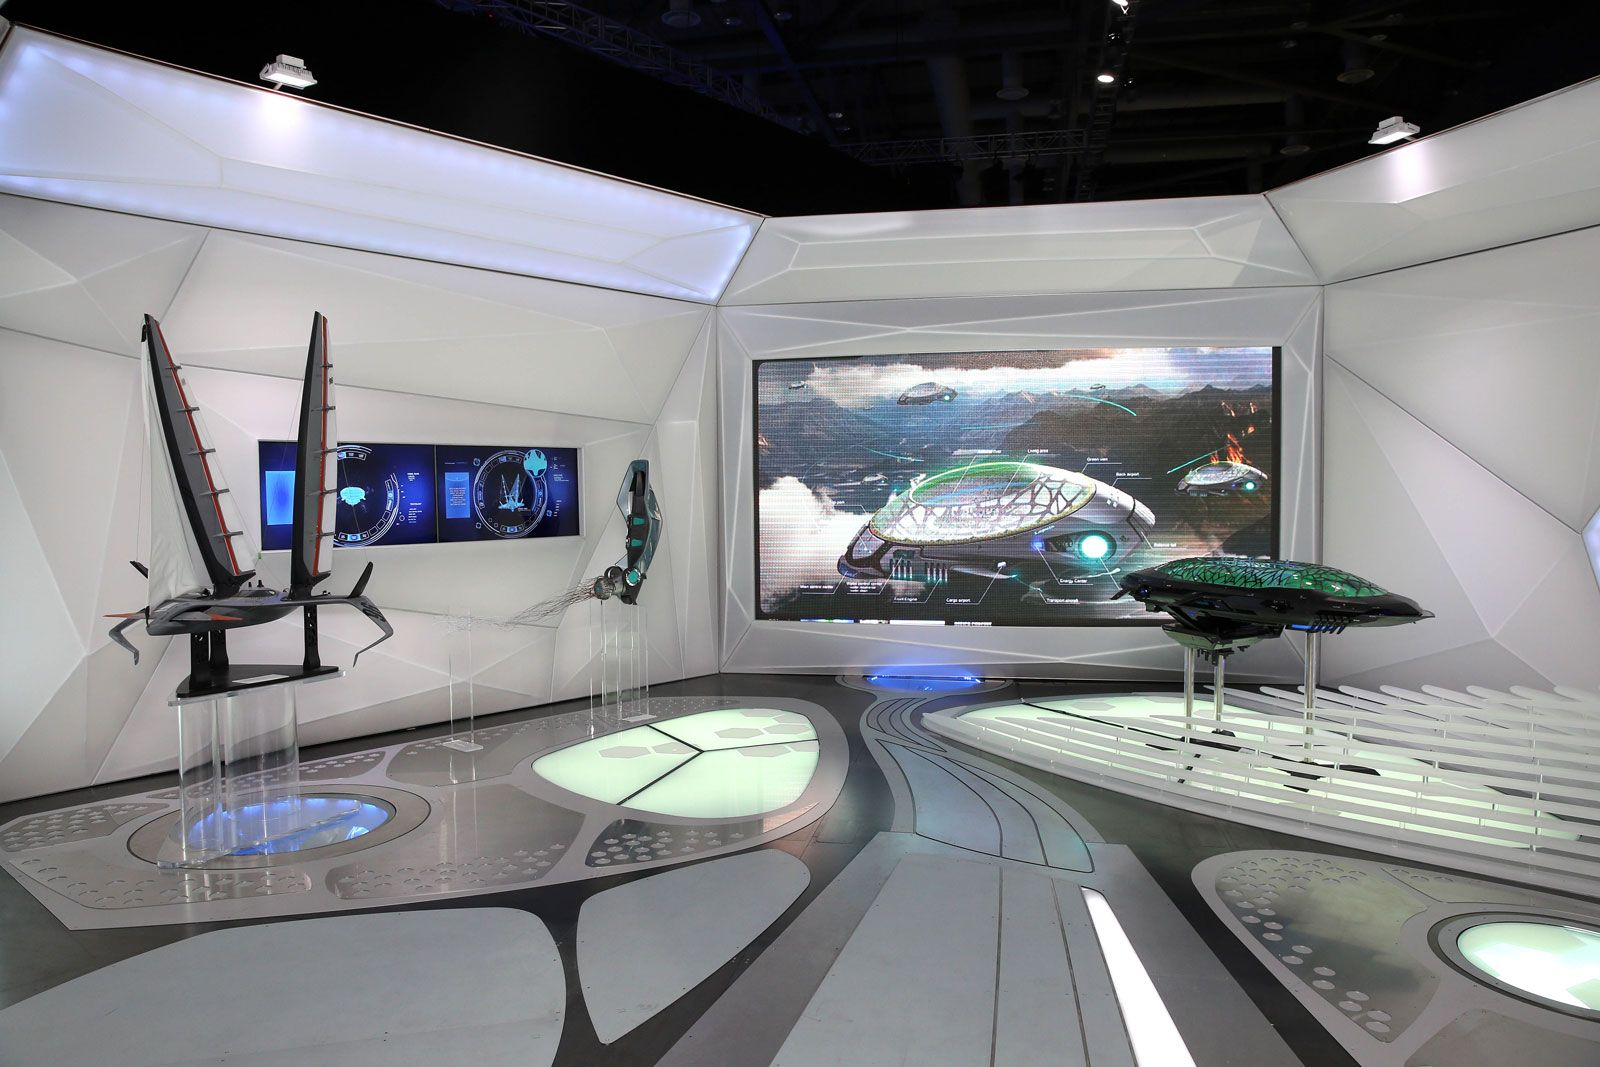 Futuristic Concepts Hyundai Stand My Baby 2013 Futuristic Concepts Cyberpunk